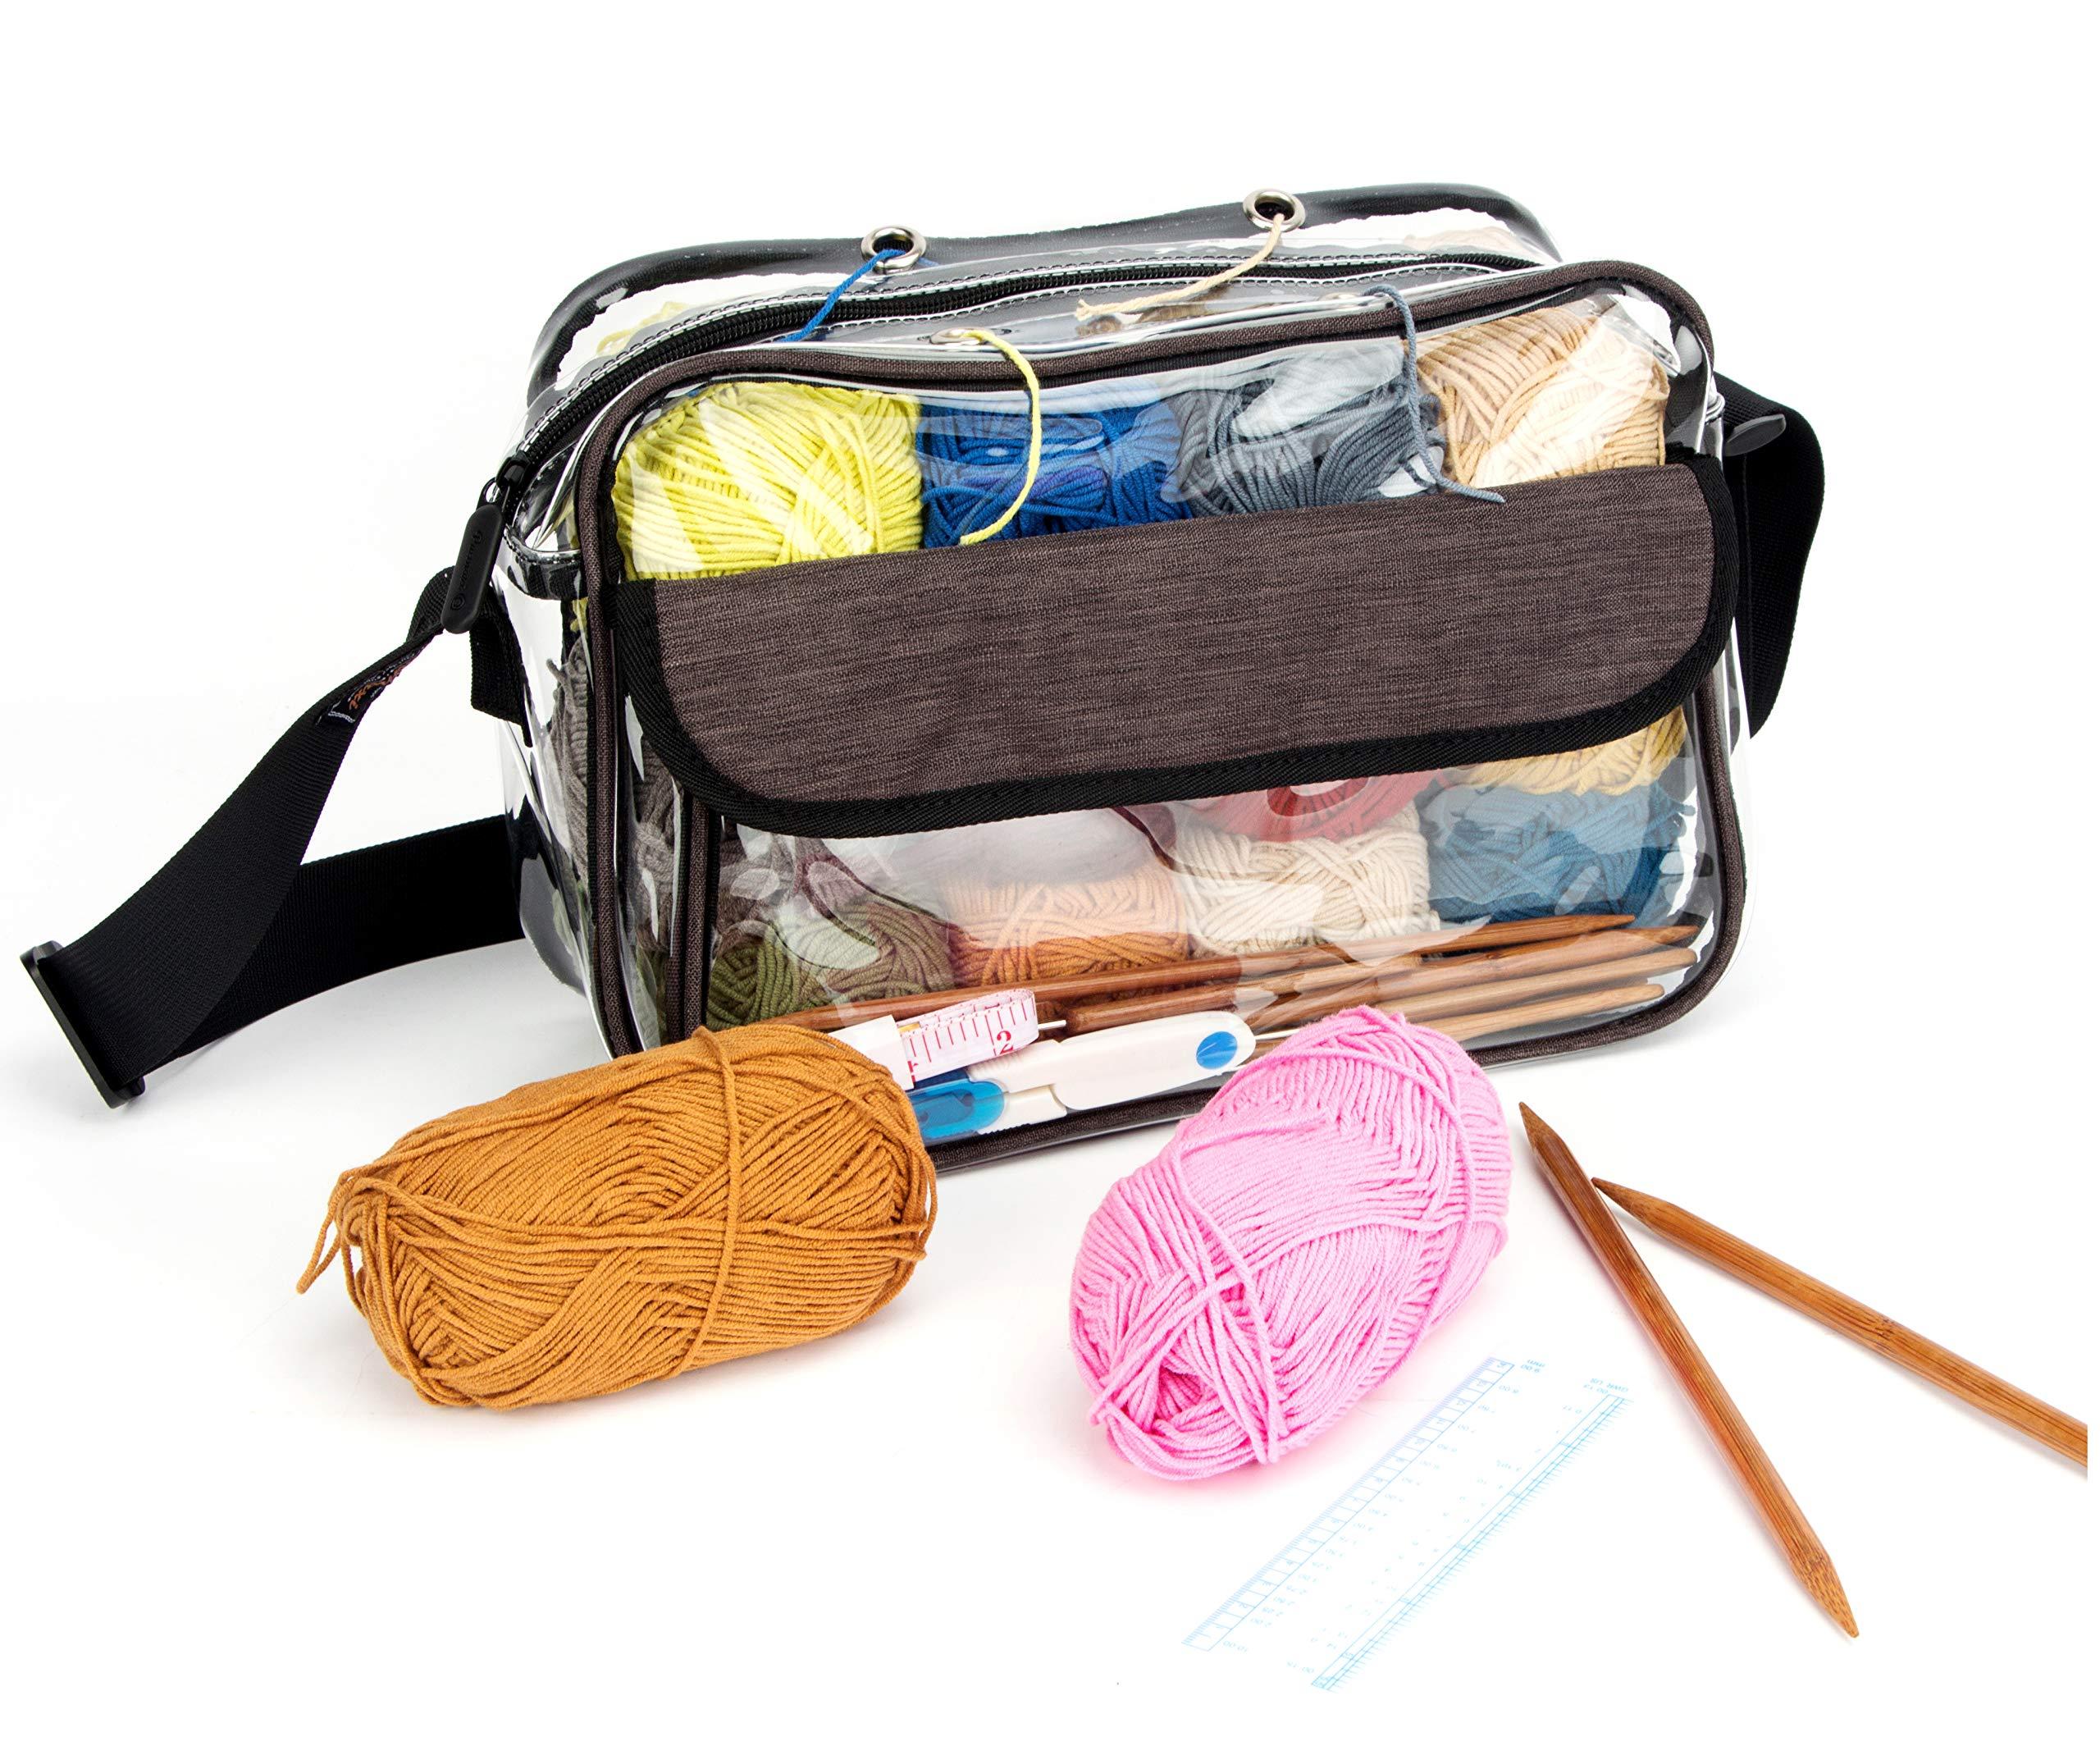 Yarn Storage Bag Knitting Bag - Clear Yarn Tote Organizer Crochet Bag for Yarn, Knitting Needles and Crochet Hooks (Medium)